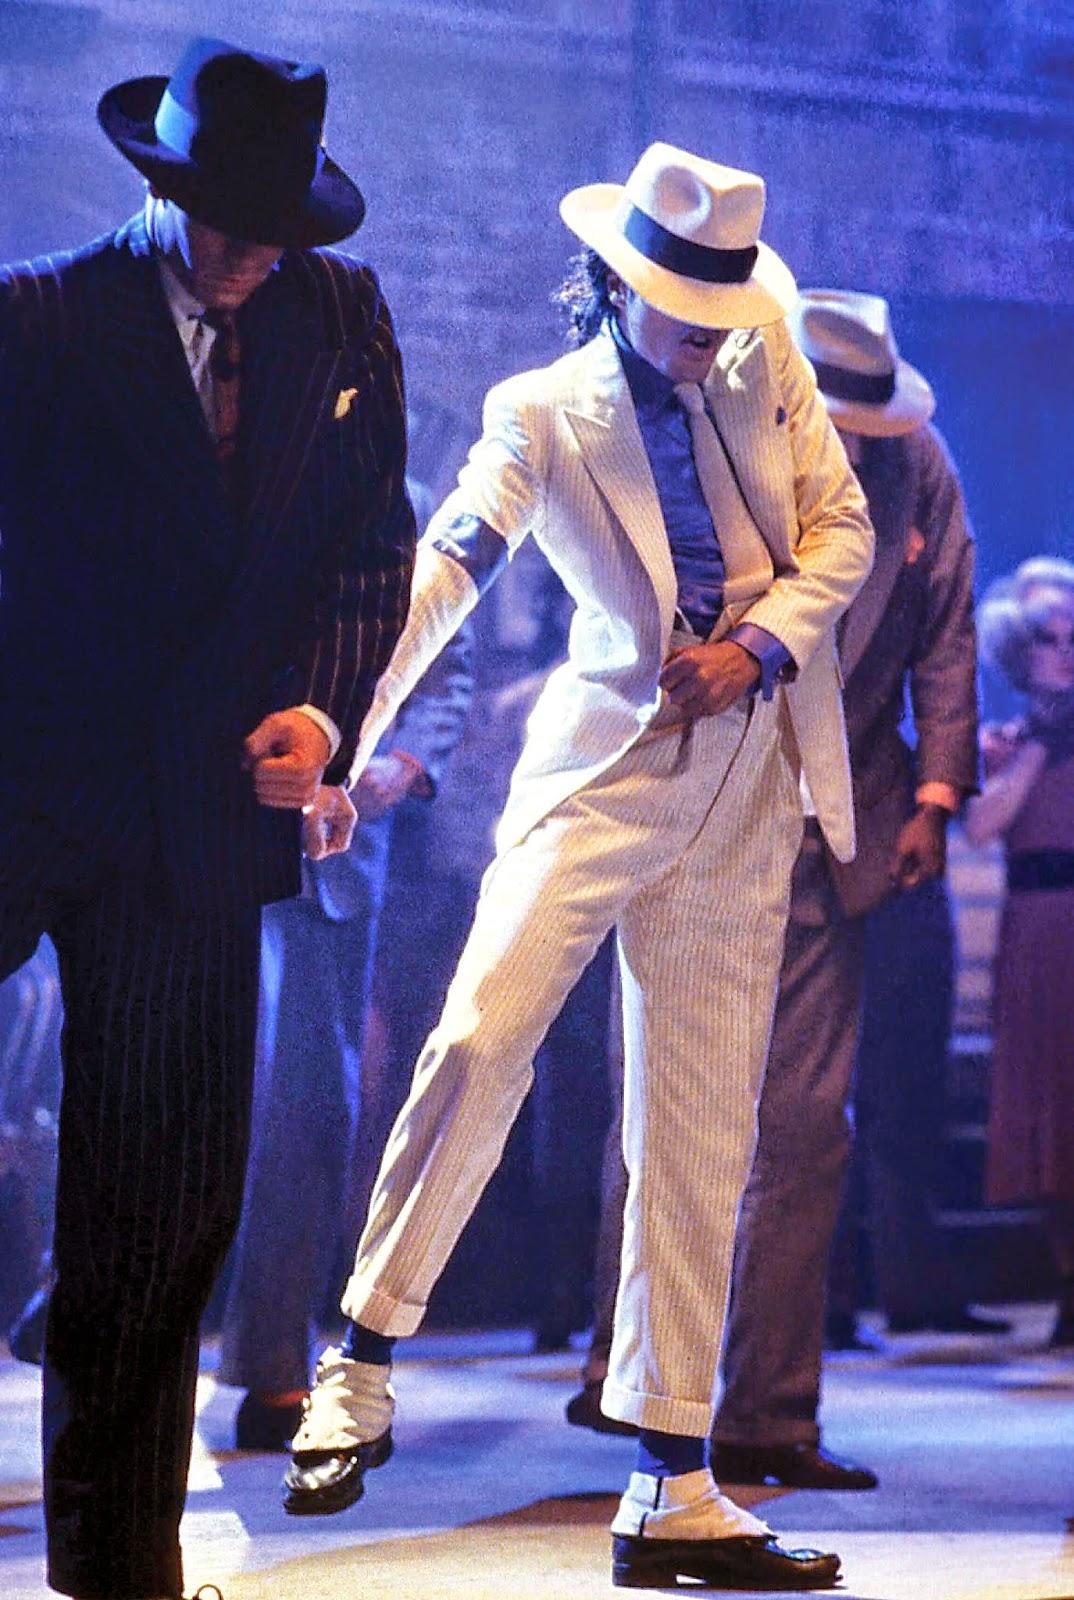 Eternamente michael jackson smooth criminal - Michael jackson smooth criminal pictures ...